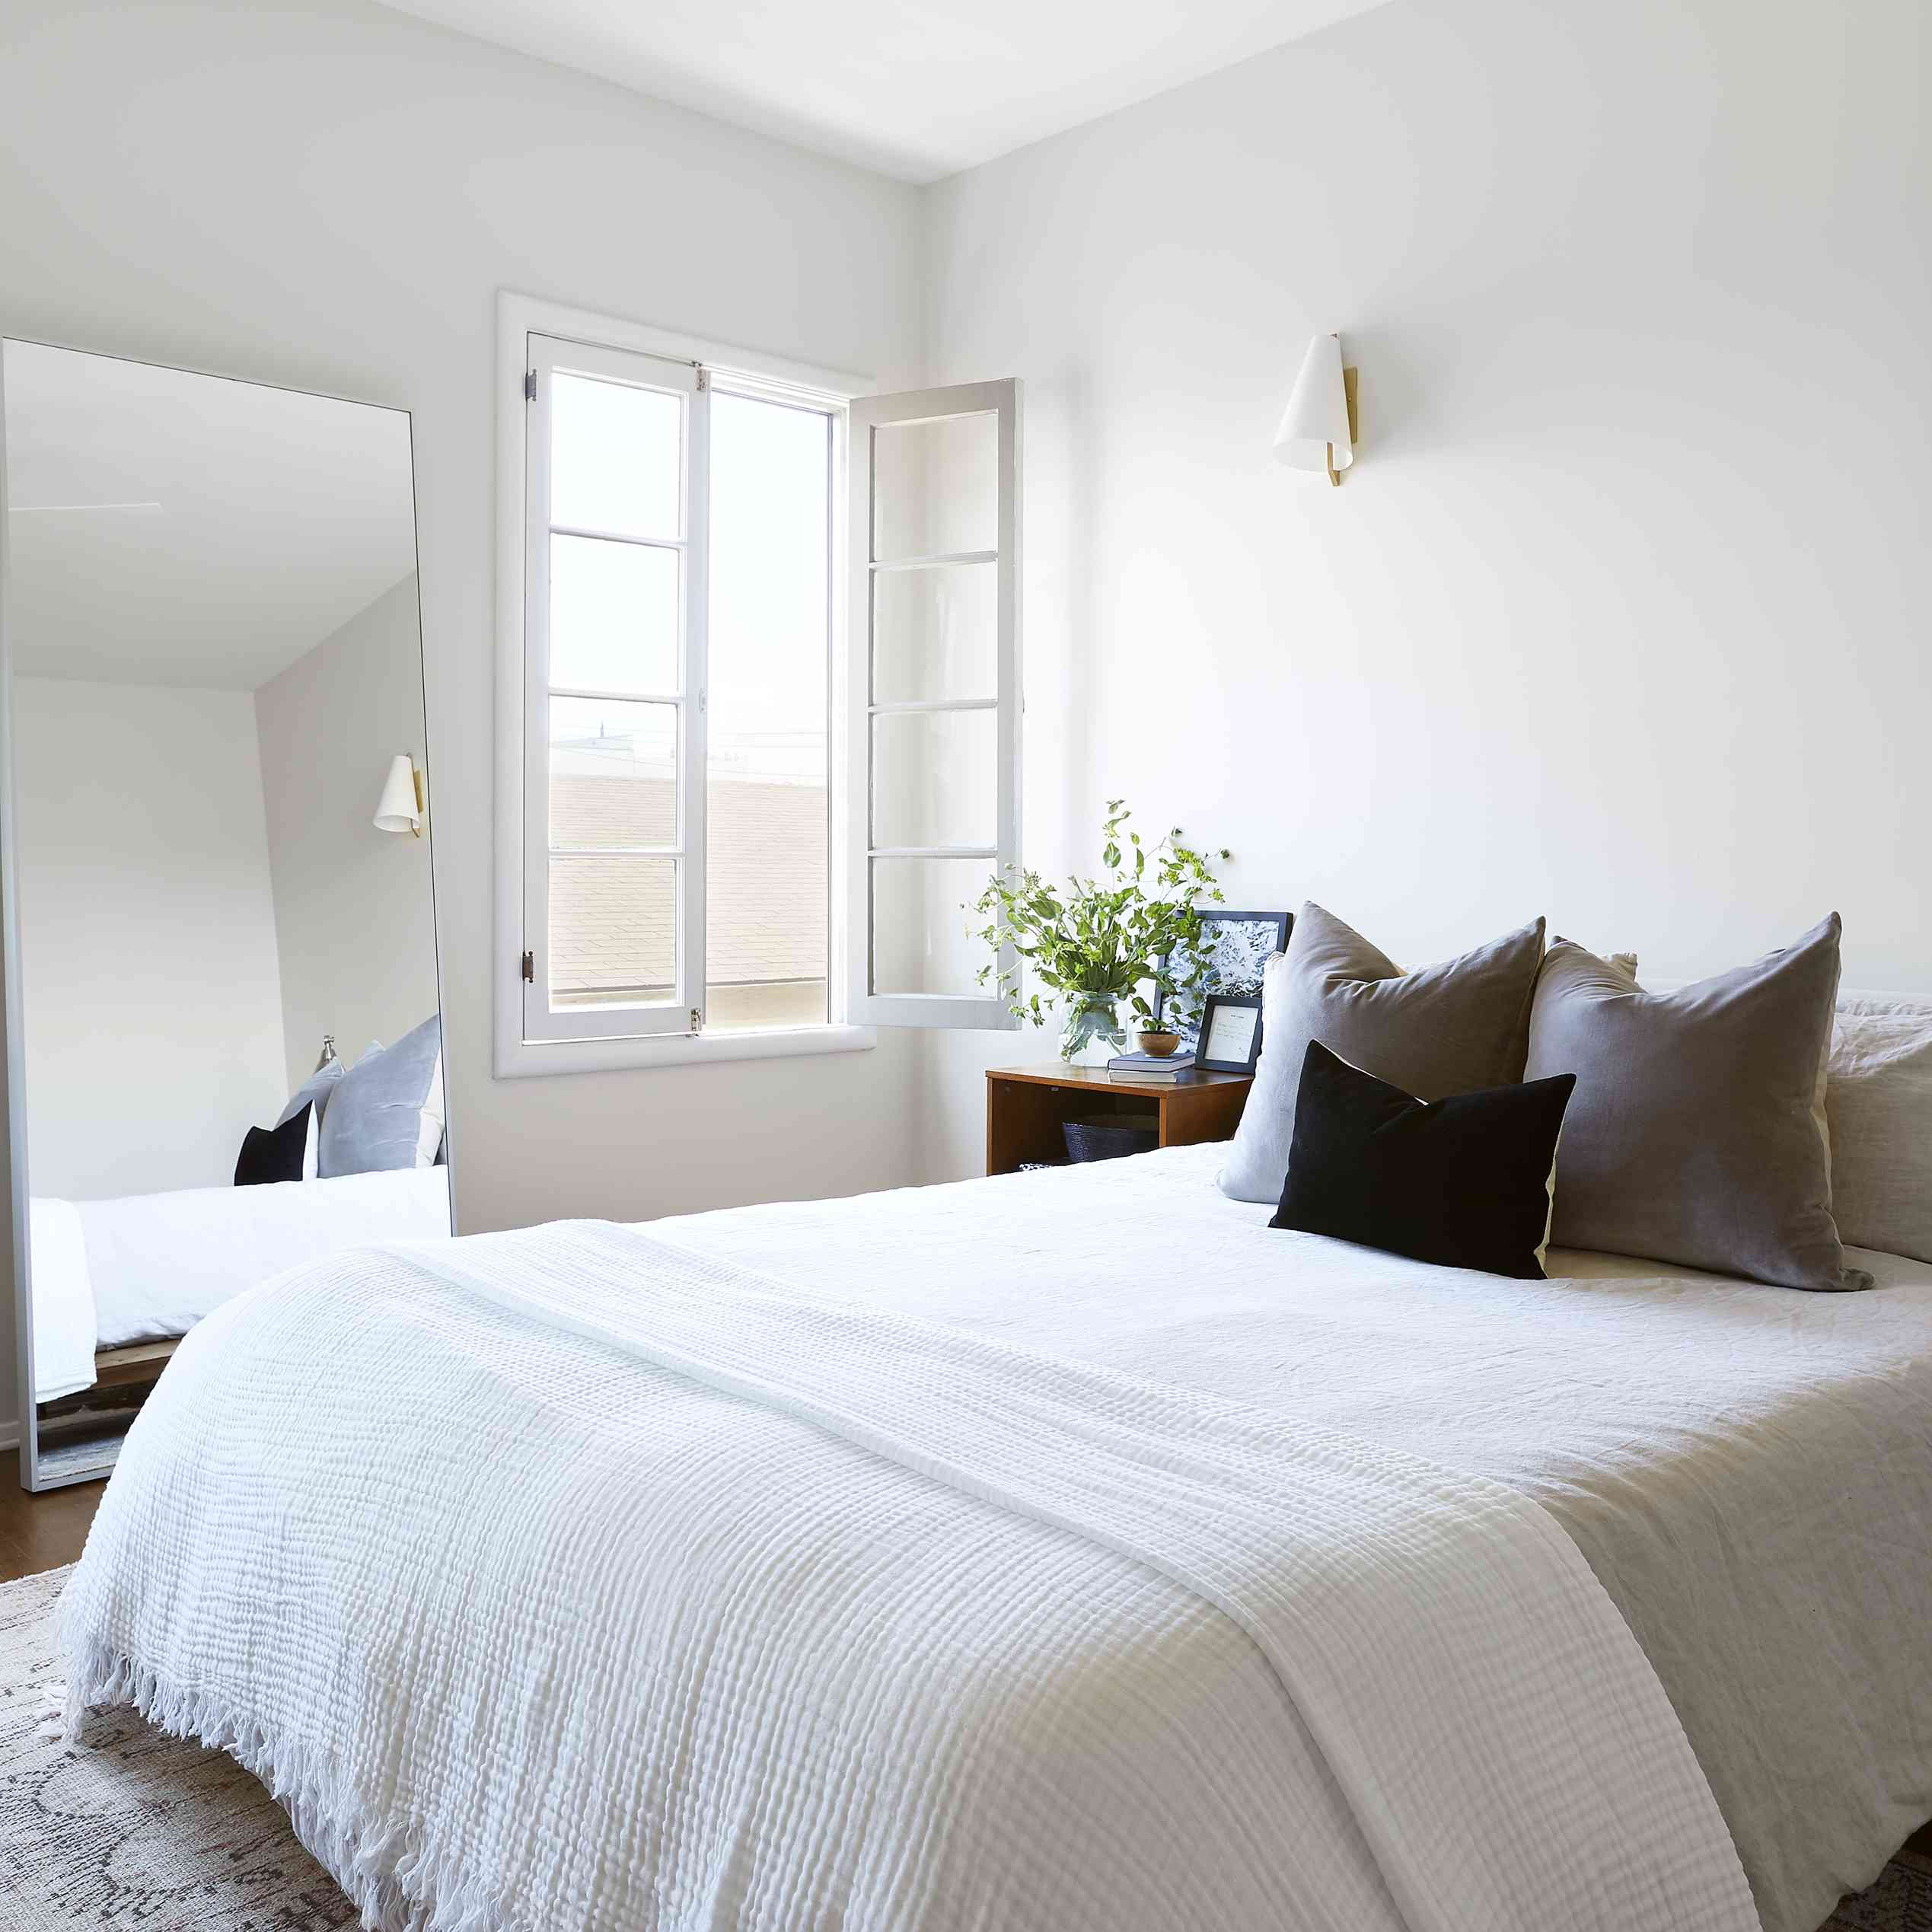 dormitorio moderno con espejo rectangular extragrande